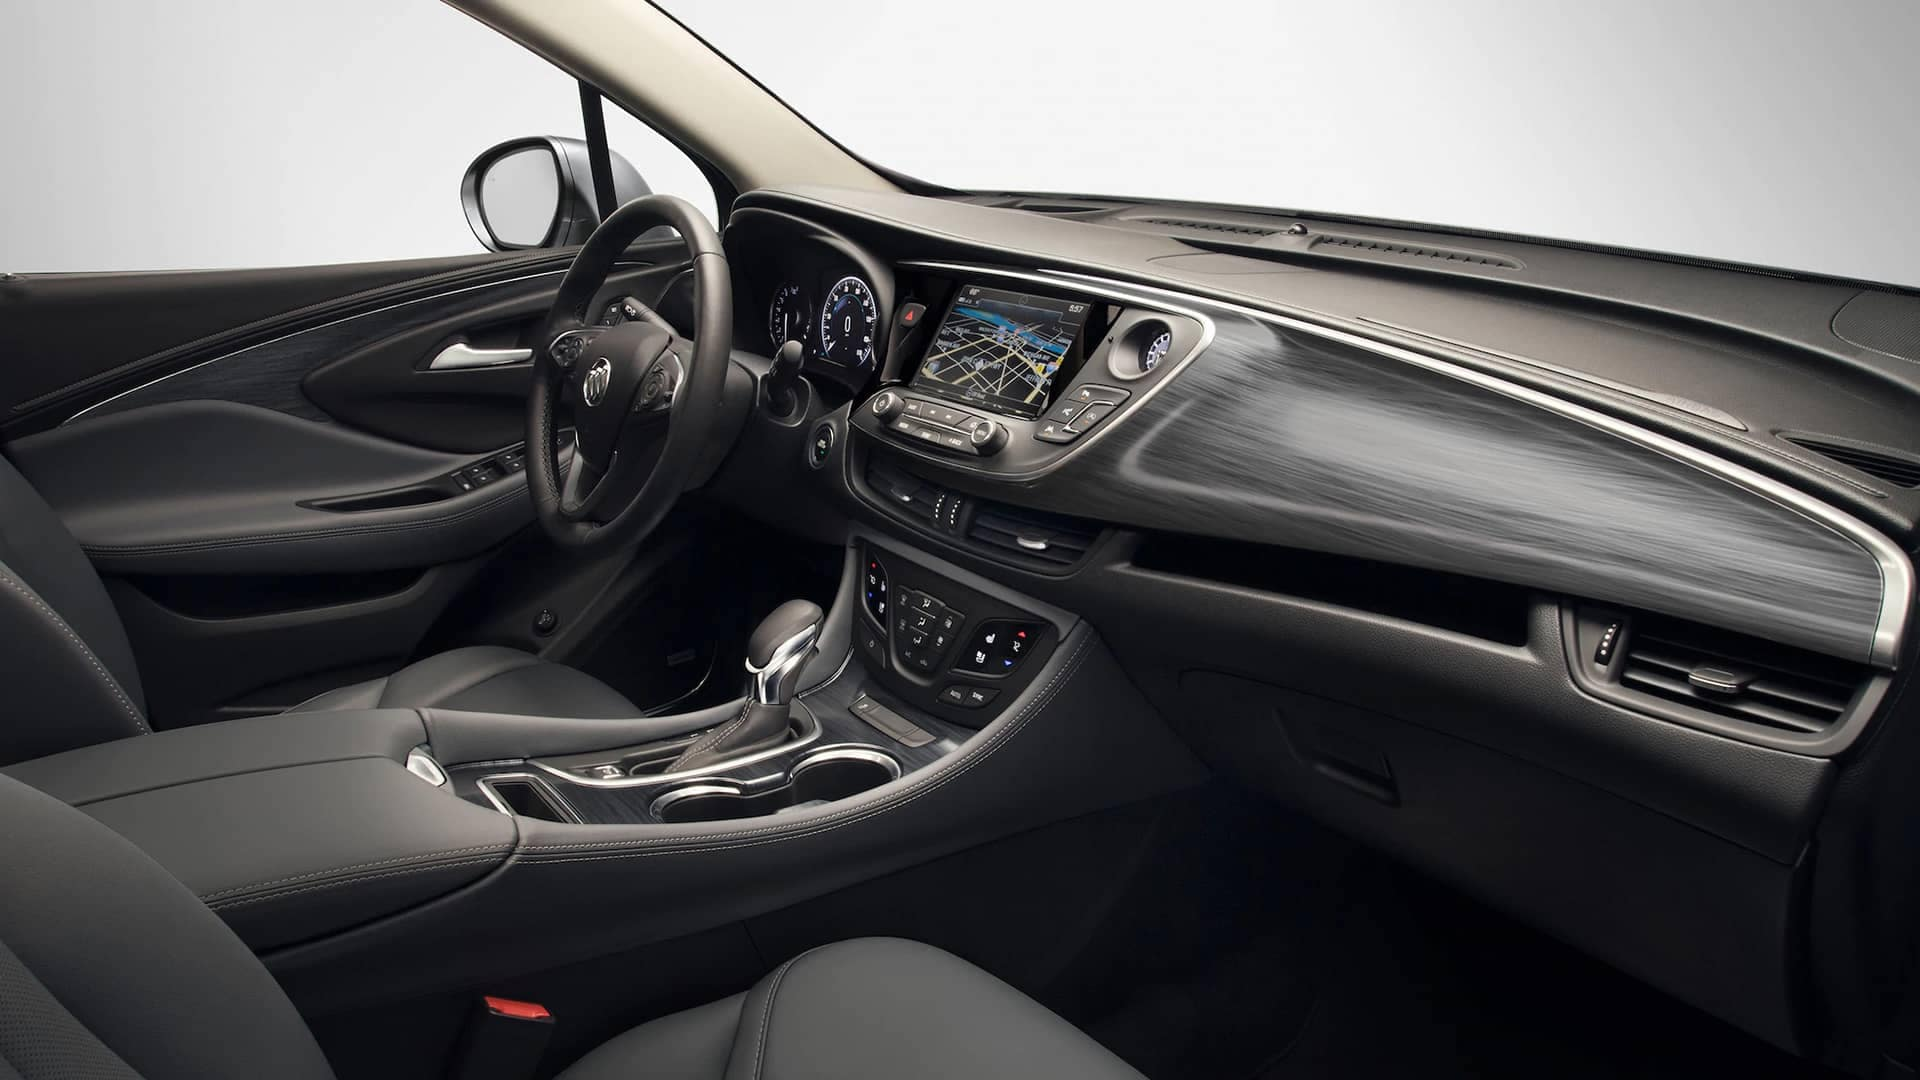 2020 Buick Envision Compact SUV Front Dash Interior